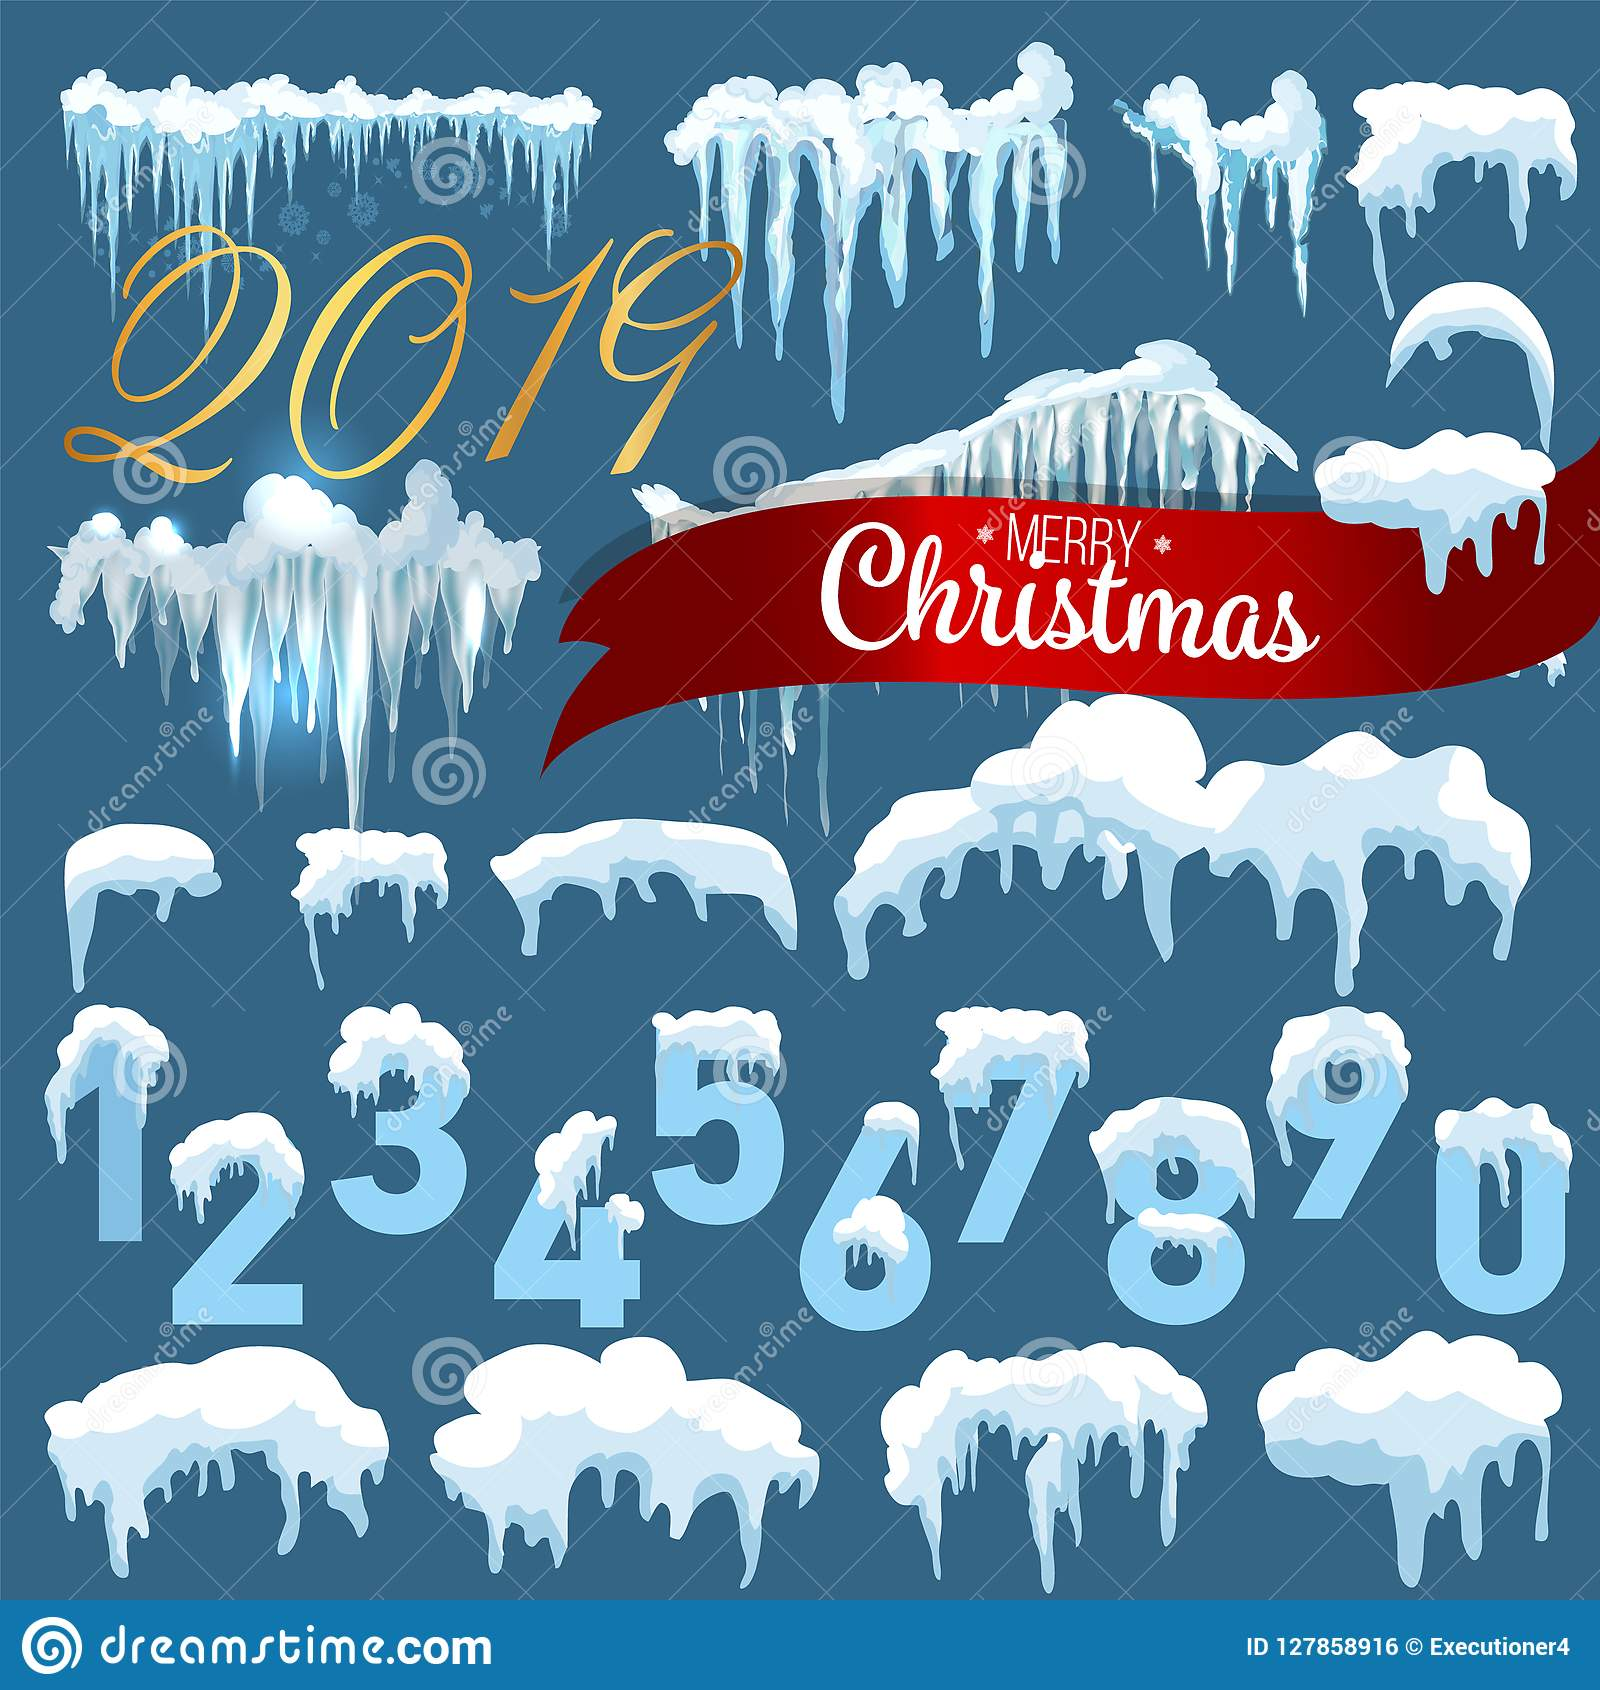 snow ice icicle set winter design 2019 christmas snow template